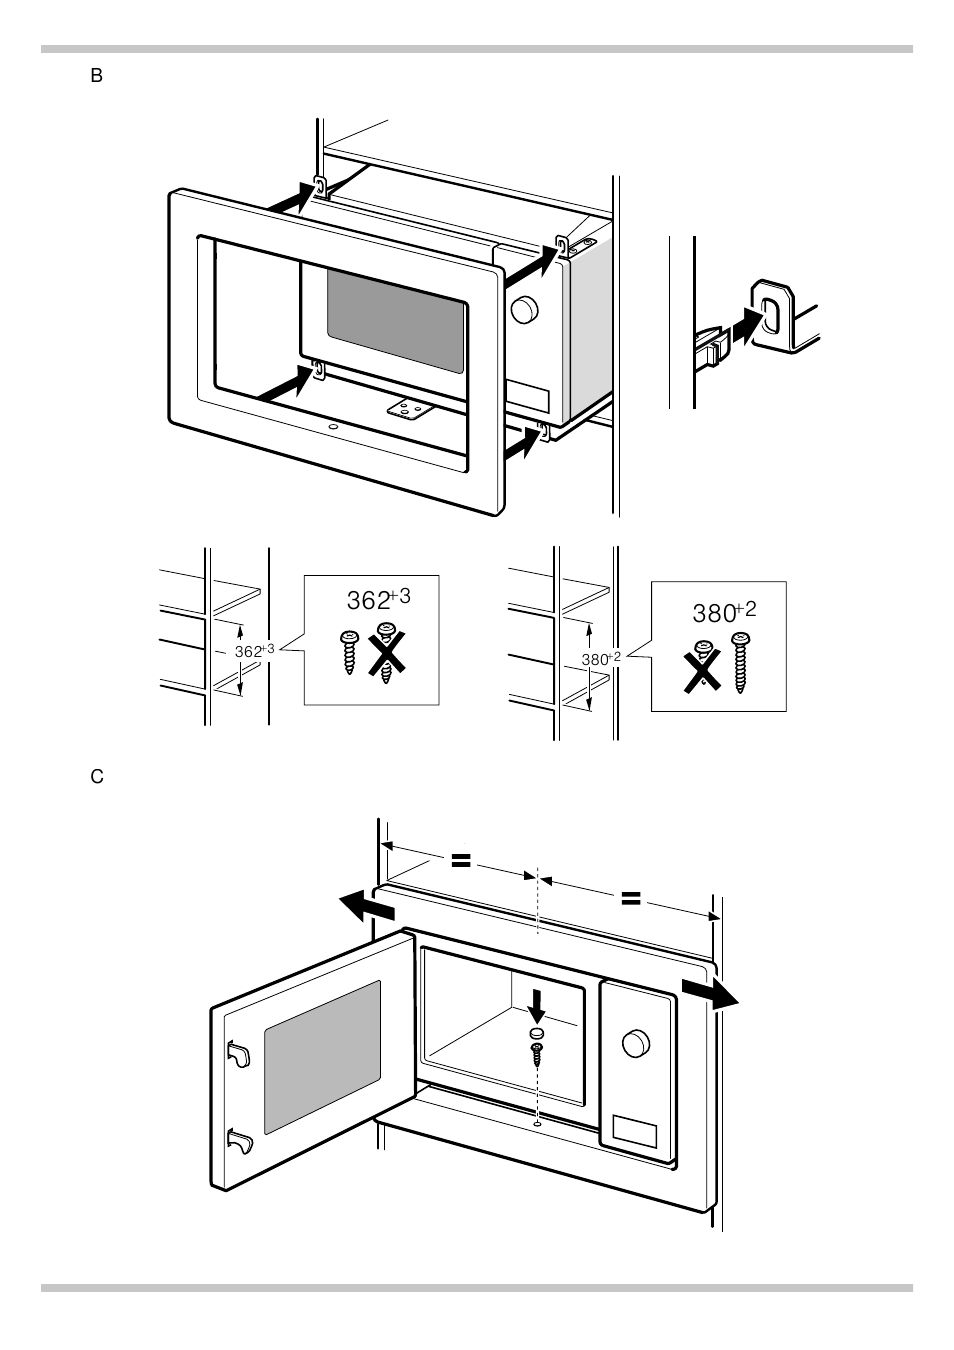 Bosch hmt75m651 edelstahl mikrowellenger t user manual for Bosch hmt75m651 inox